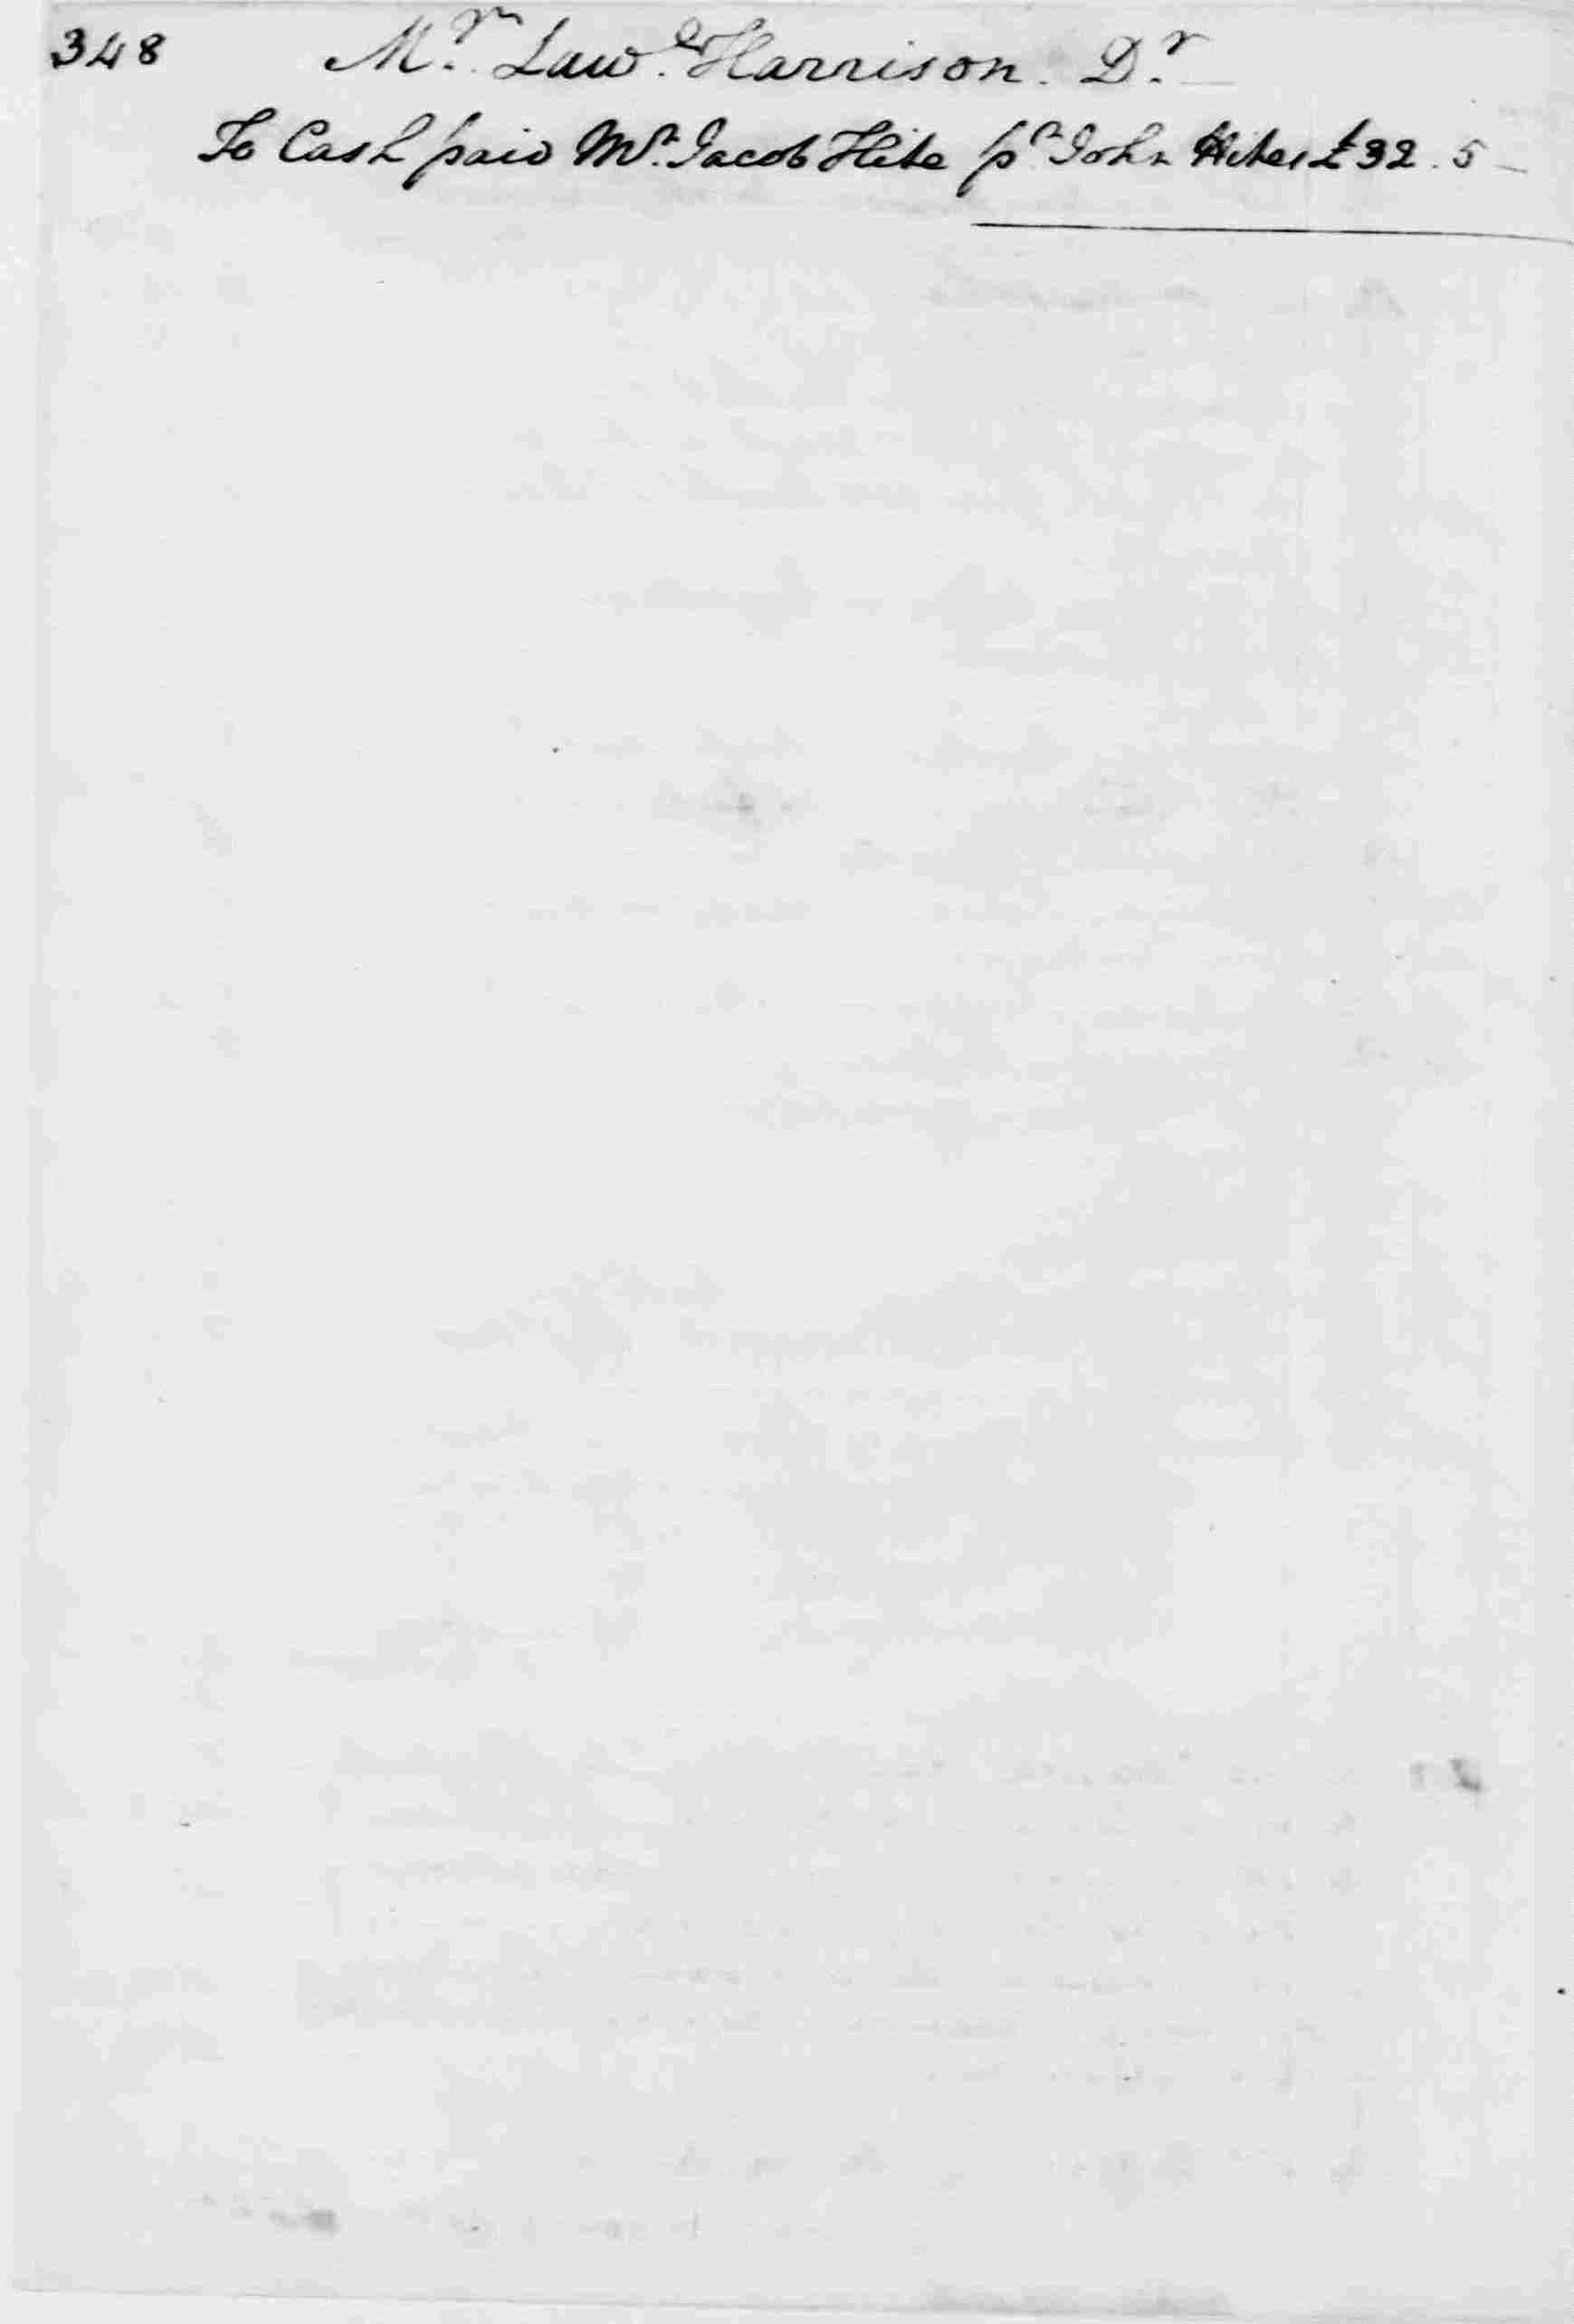 Ledger A, folio 348, left side